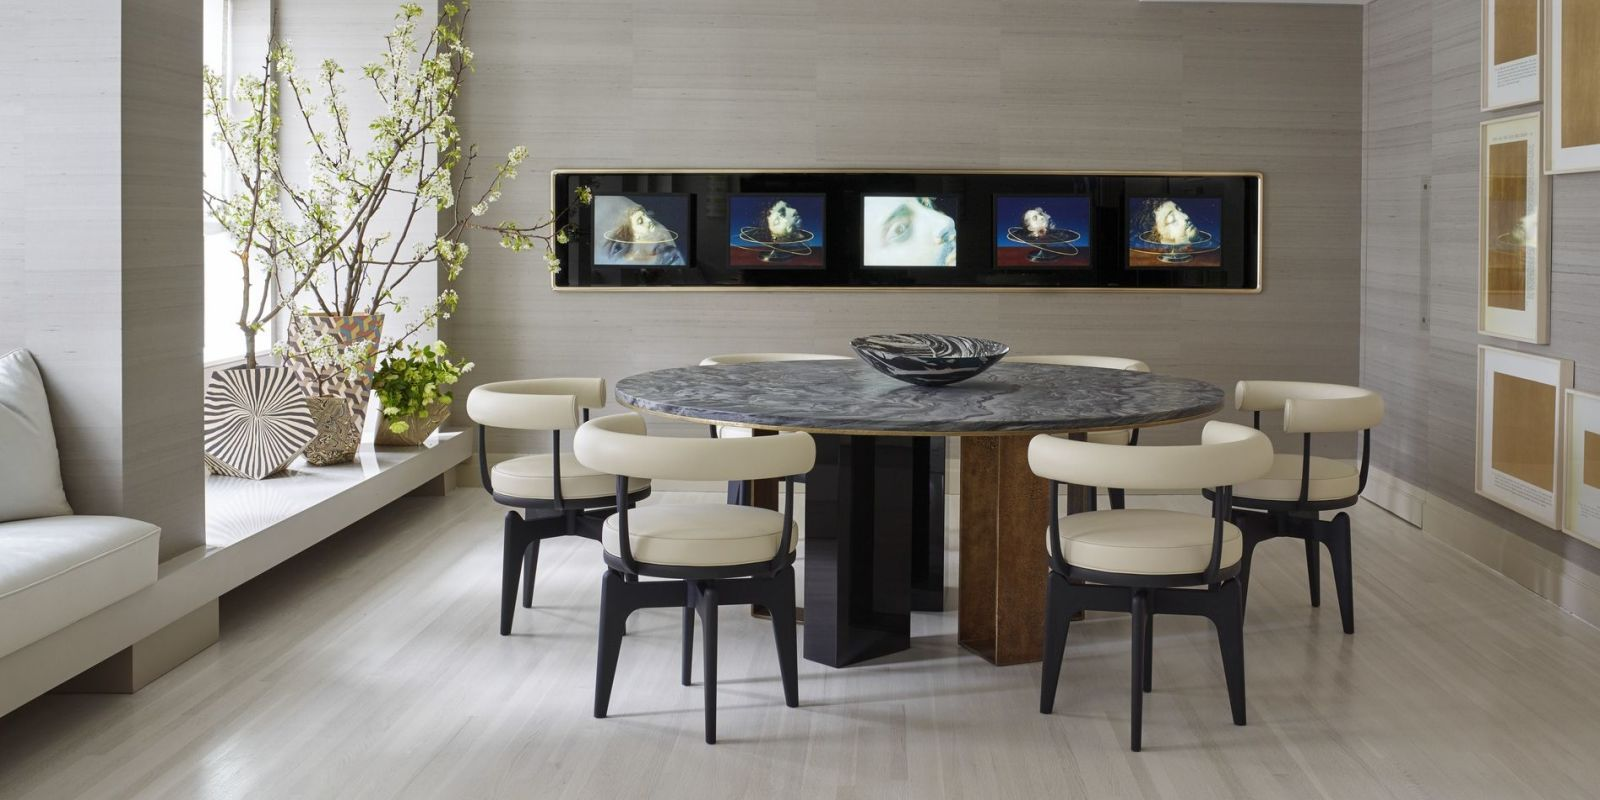 25 Modern Dining Room Decorating Ideas  Contemporary